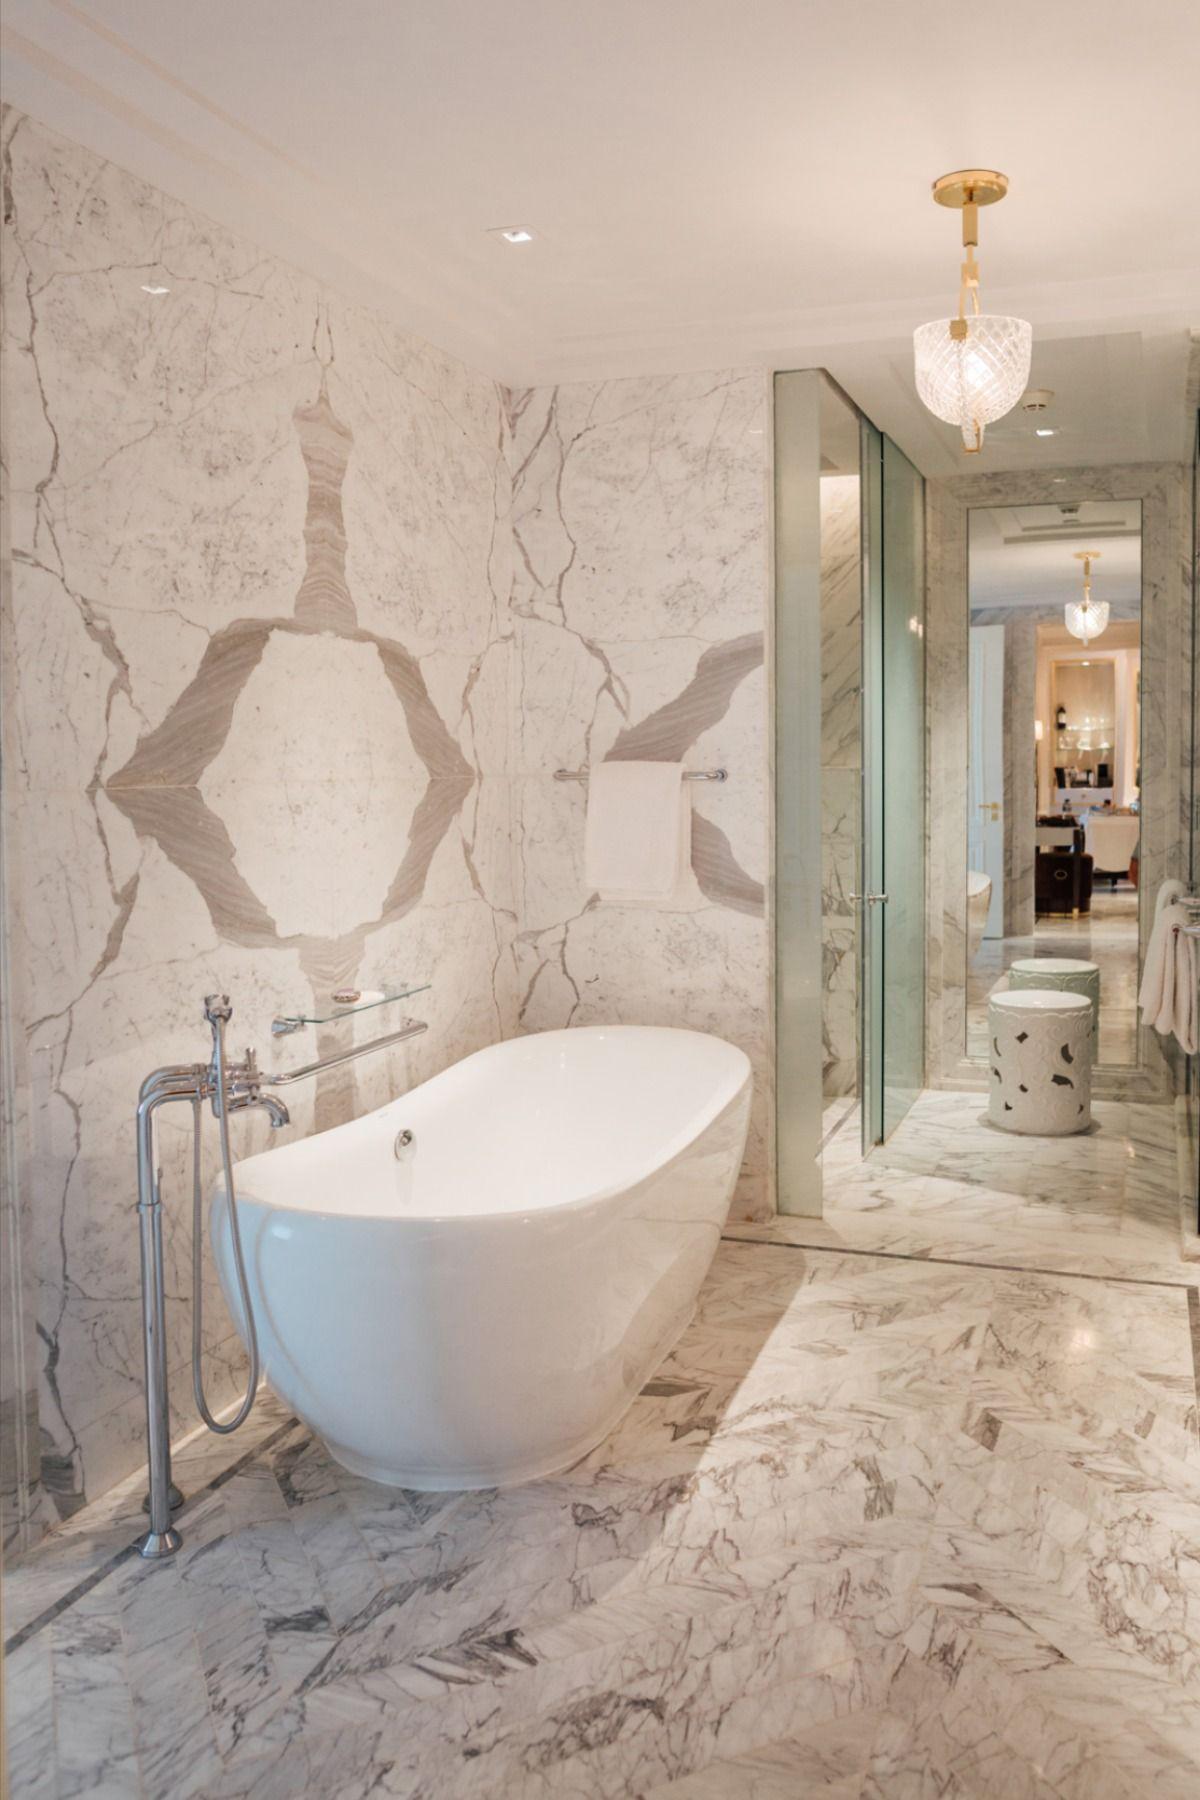 Maison Valentina Luxury Bathrooms Luxury Bathroom Marble Bathroom Designs Luxury Bathroom Shower